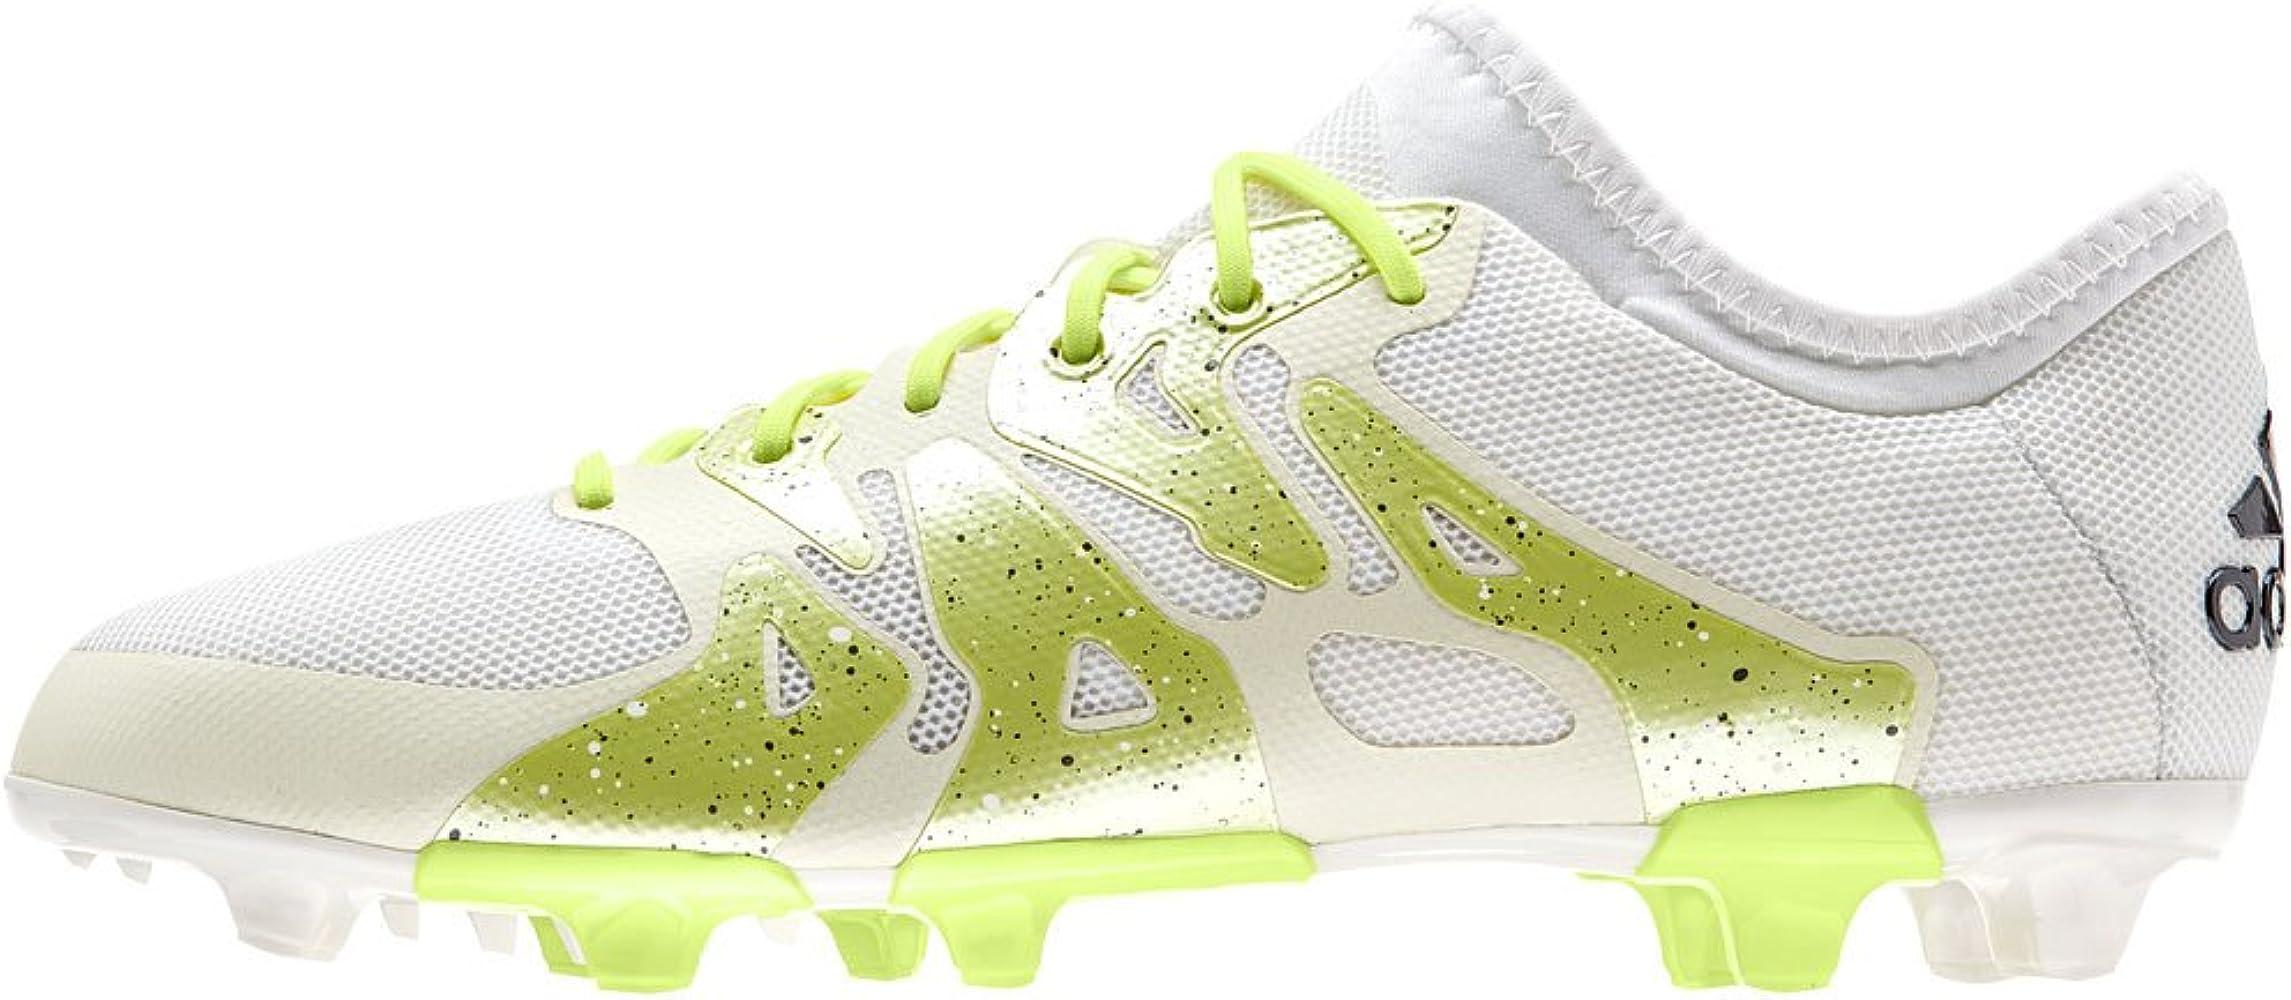 frijoles dolor de muelas pasado  Amazon.com | adidas Womens X 15.2 FG/AG Firm Ground/Artificial Grass Soccer  Cleats 7 1/2 US, White/Frozen Yellow/Grey | Soccer